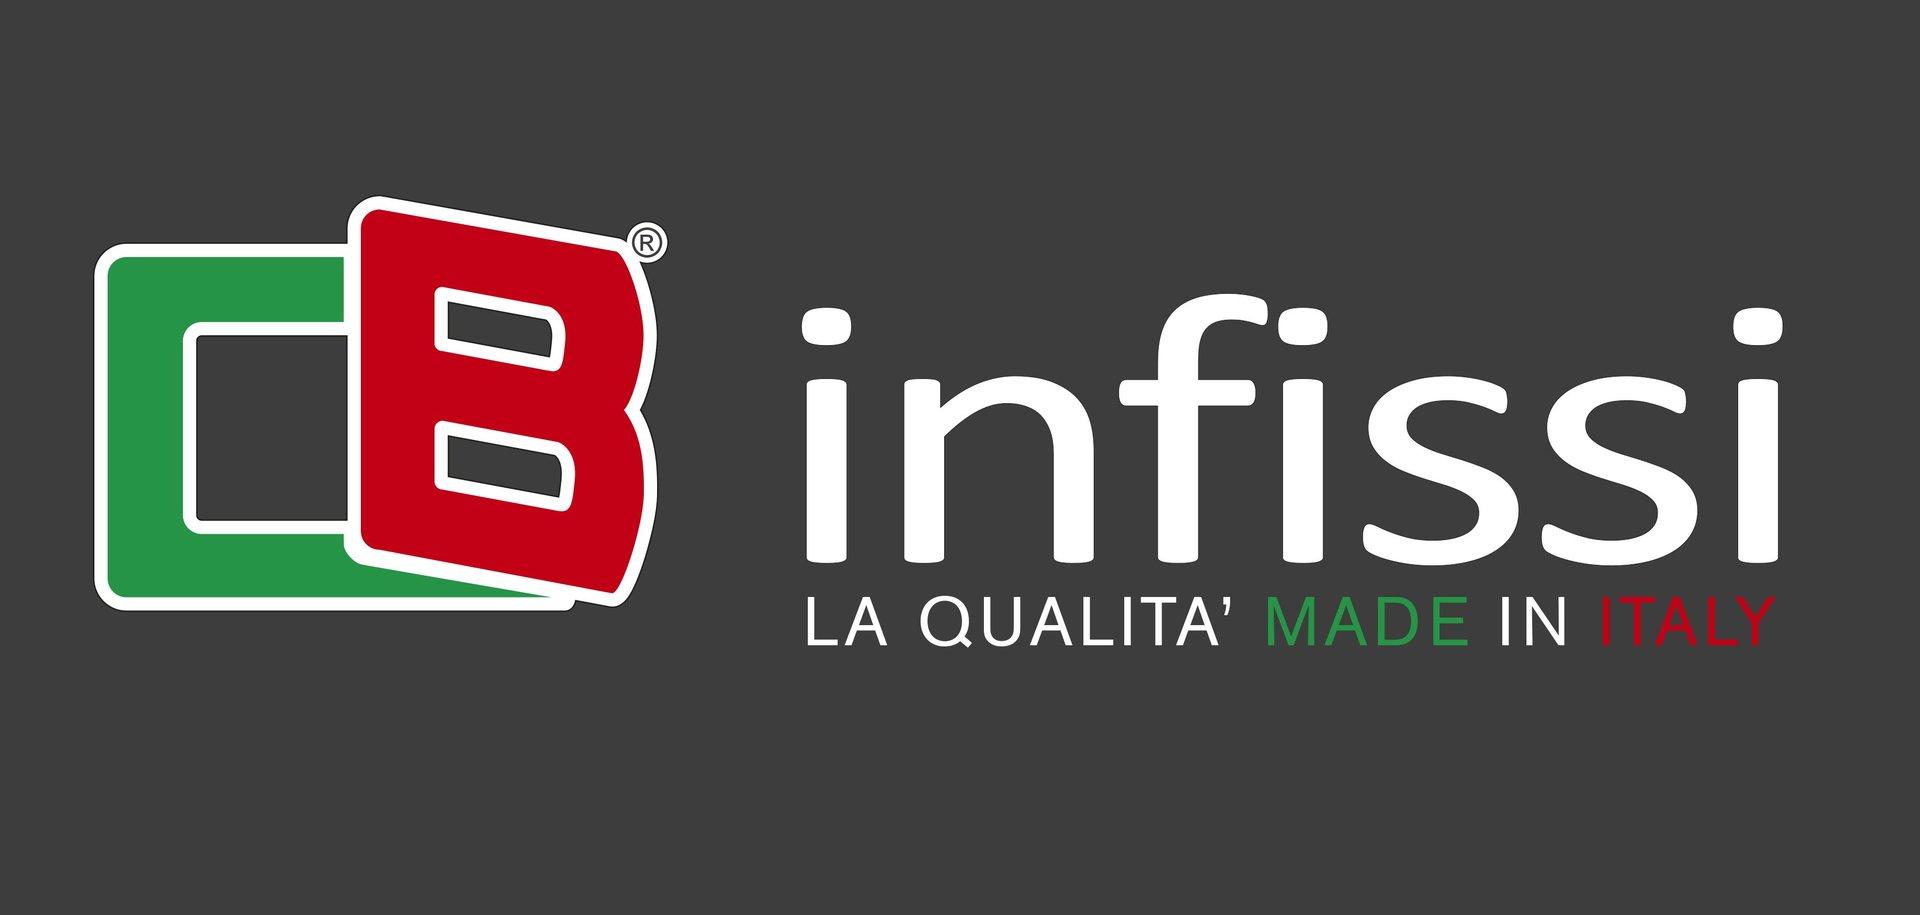 CB INFISSI - LOGO